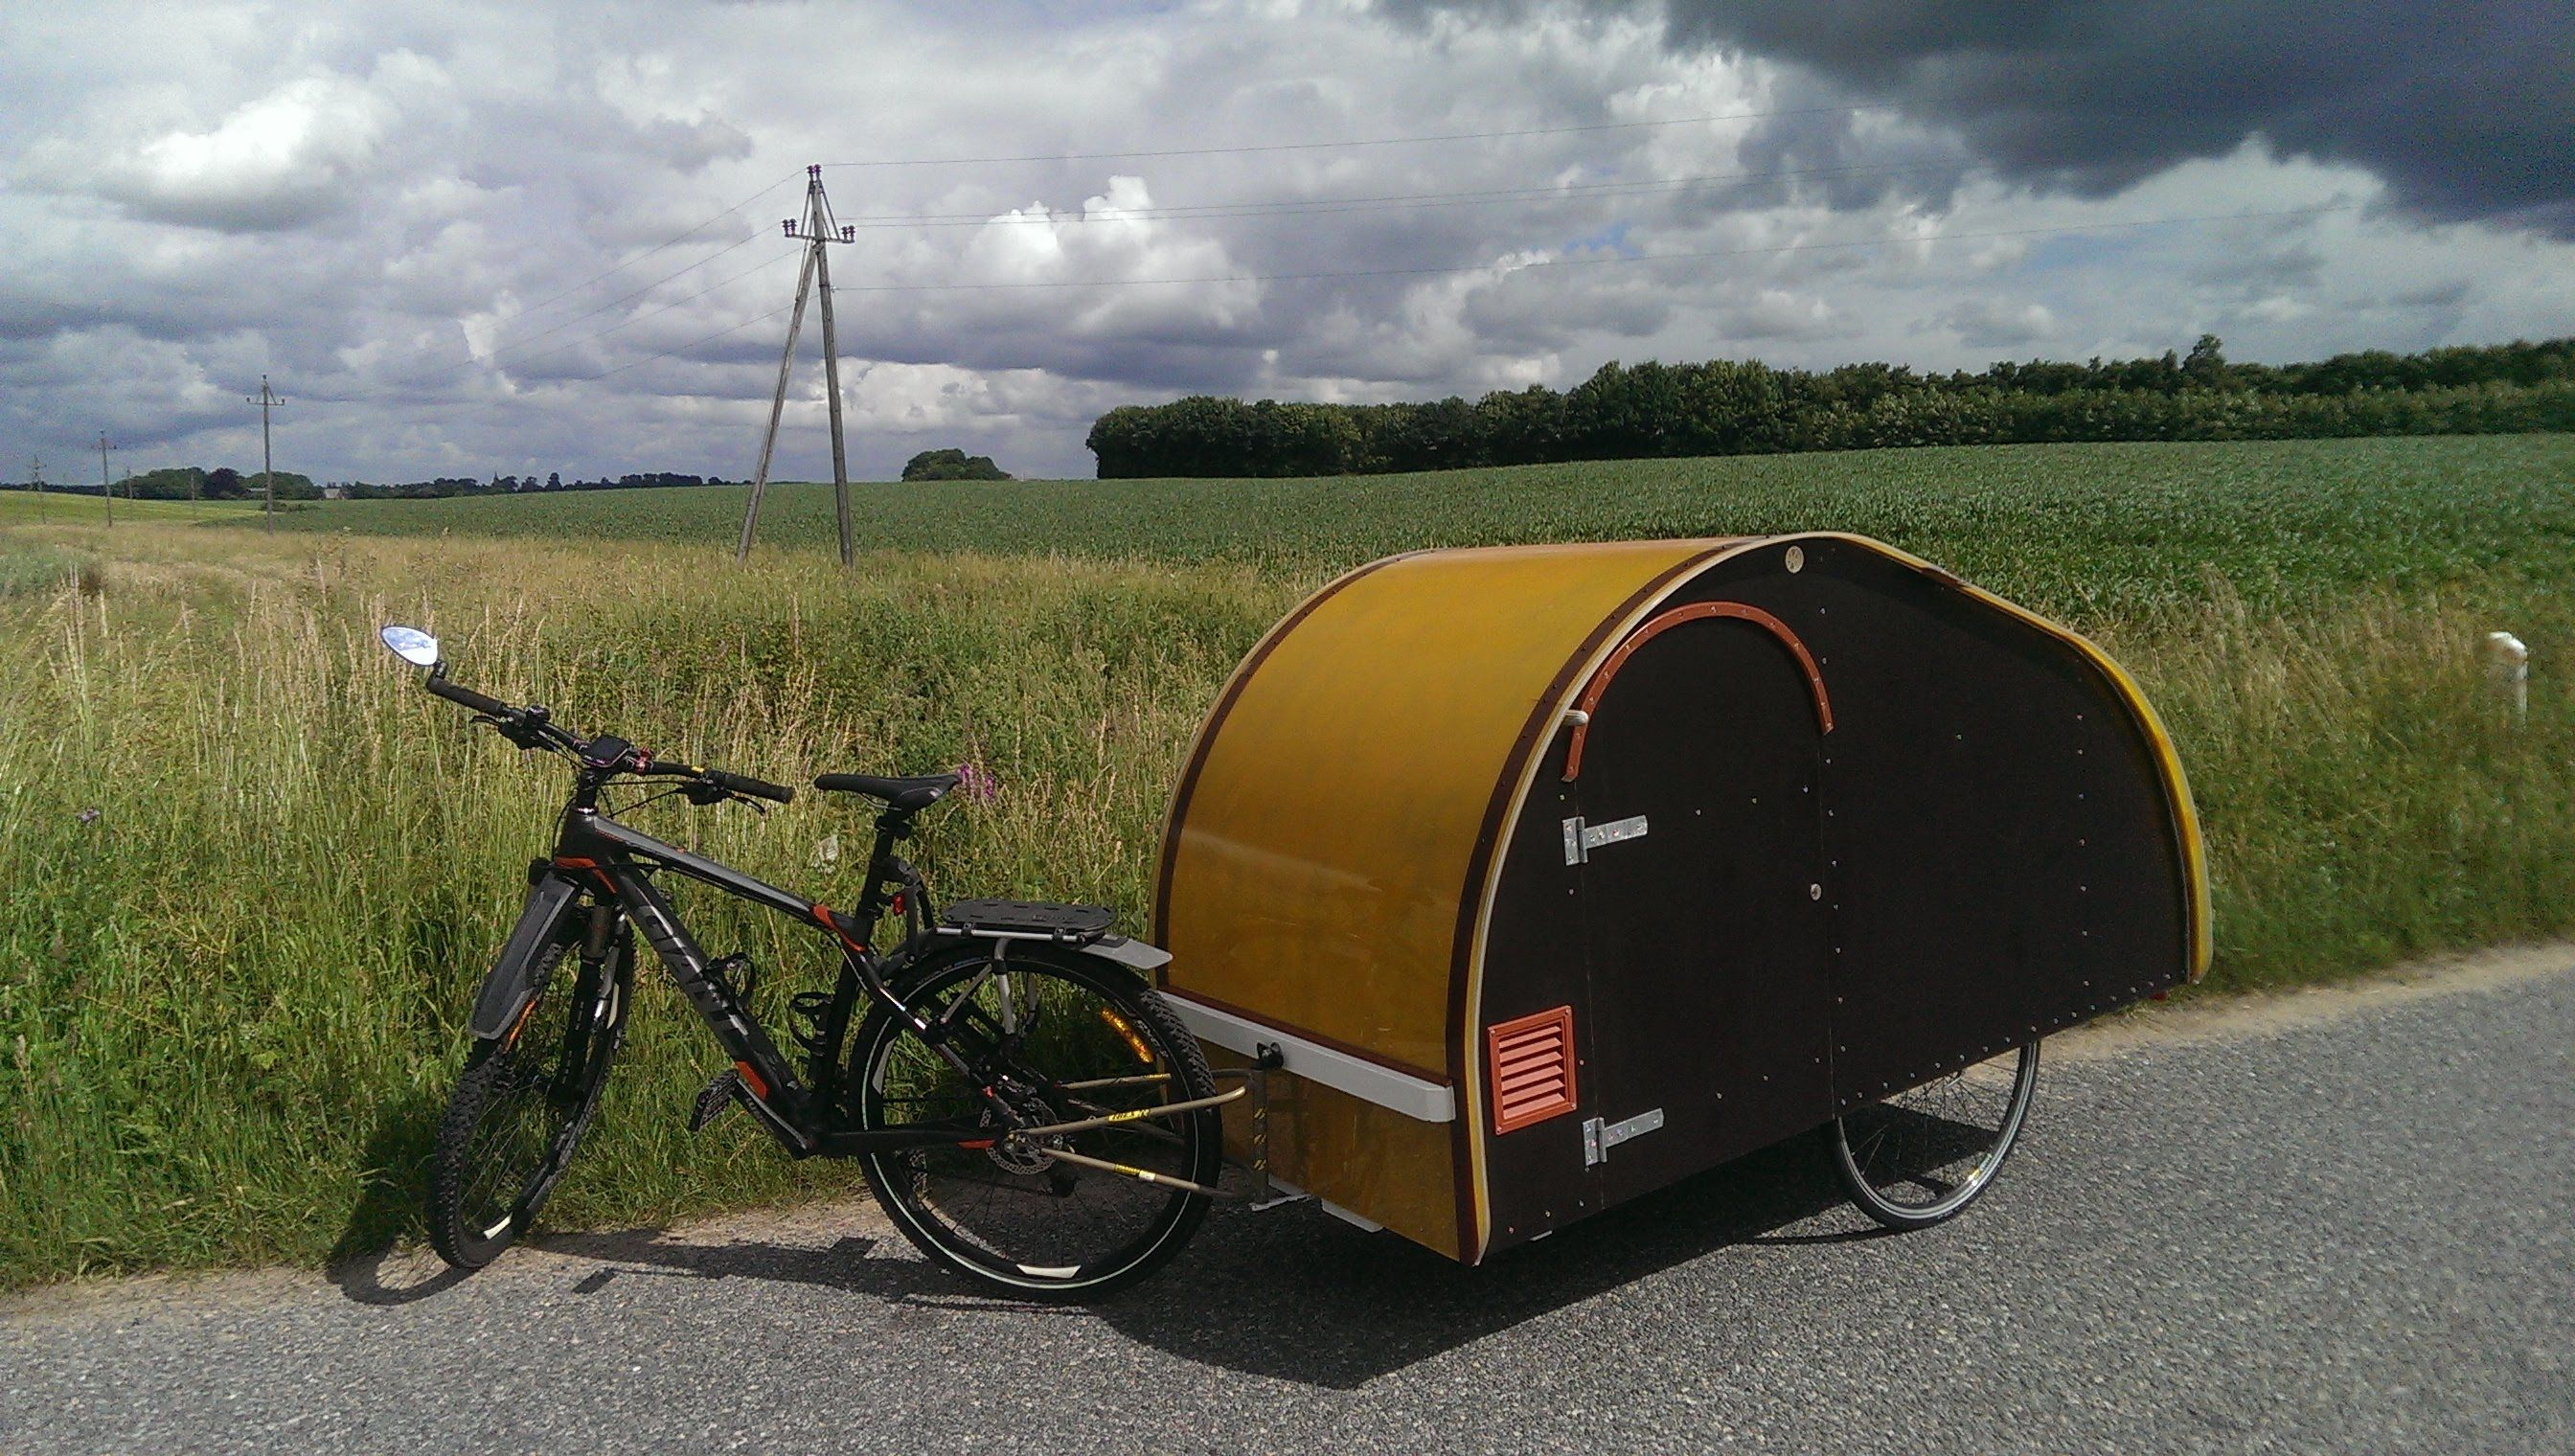 homemade teardrop bicycle micro camper trailer fahrrad. Black Bedroom Furniture Sets. Home Design Ideas